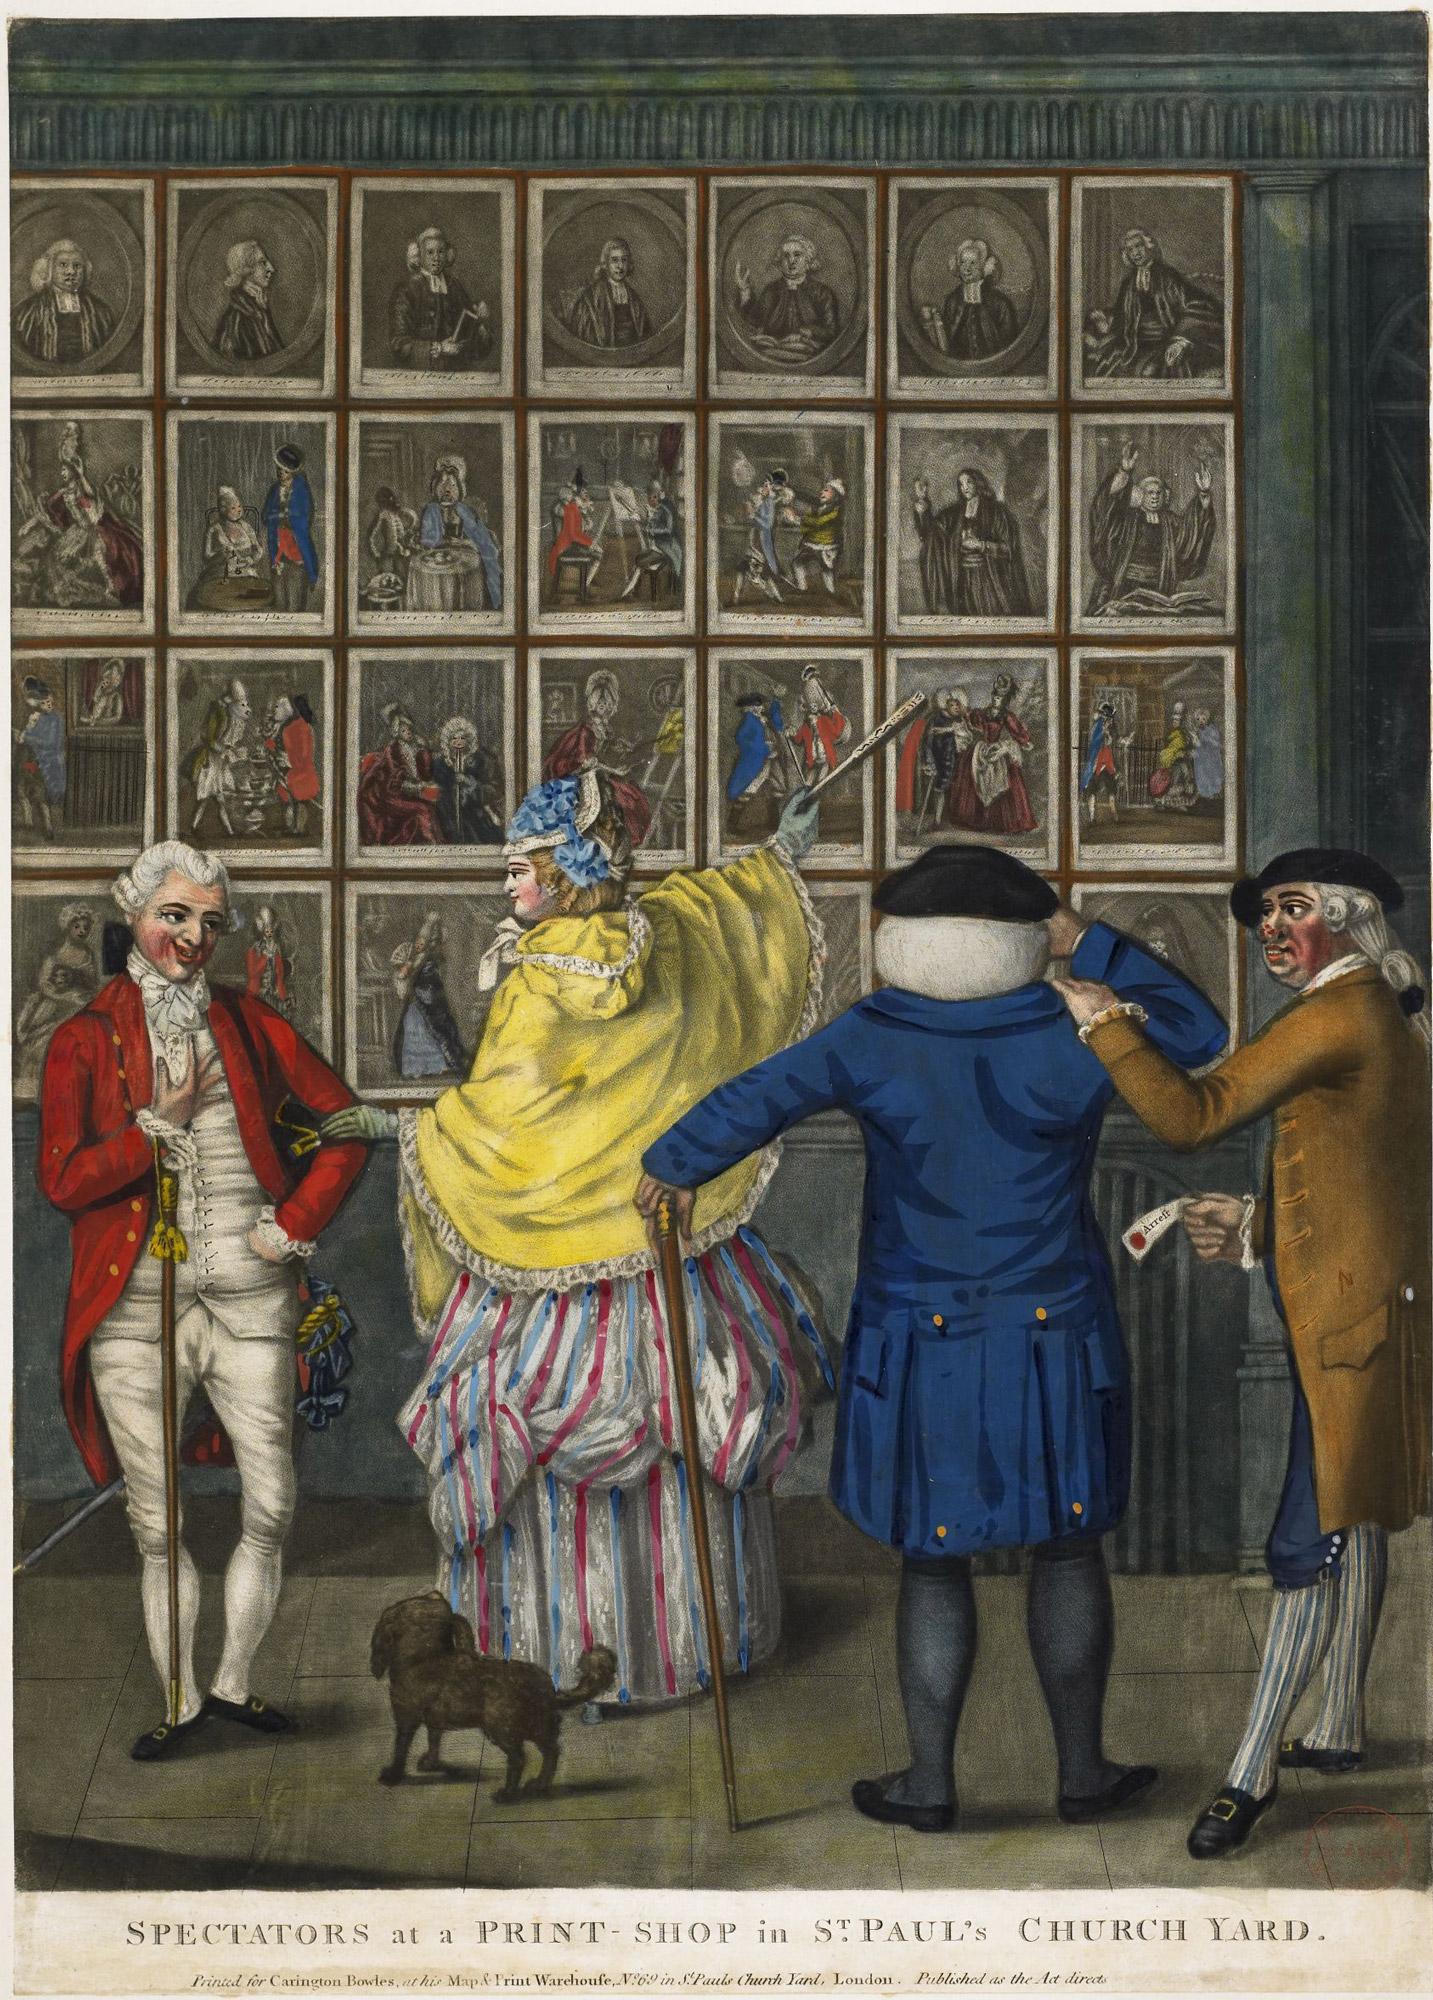 Spectators at a Print-Shop in St. Paul's Church Yard, London